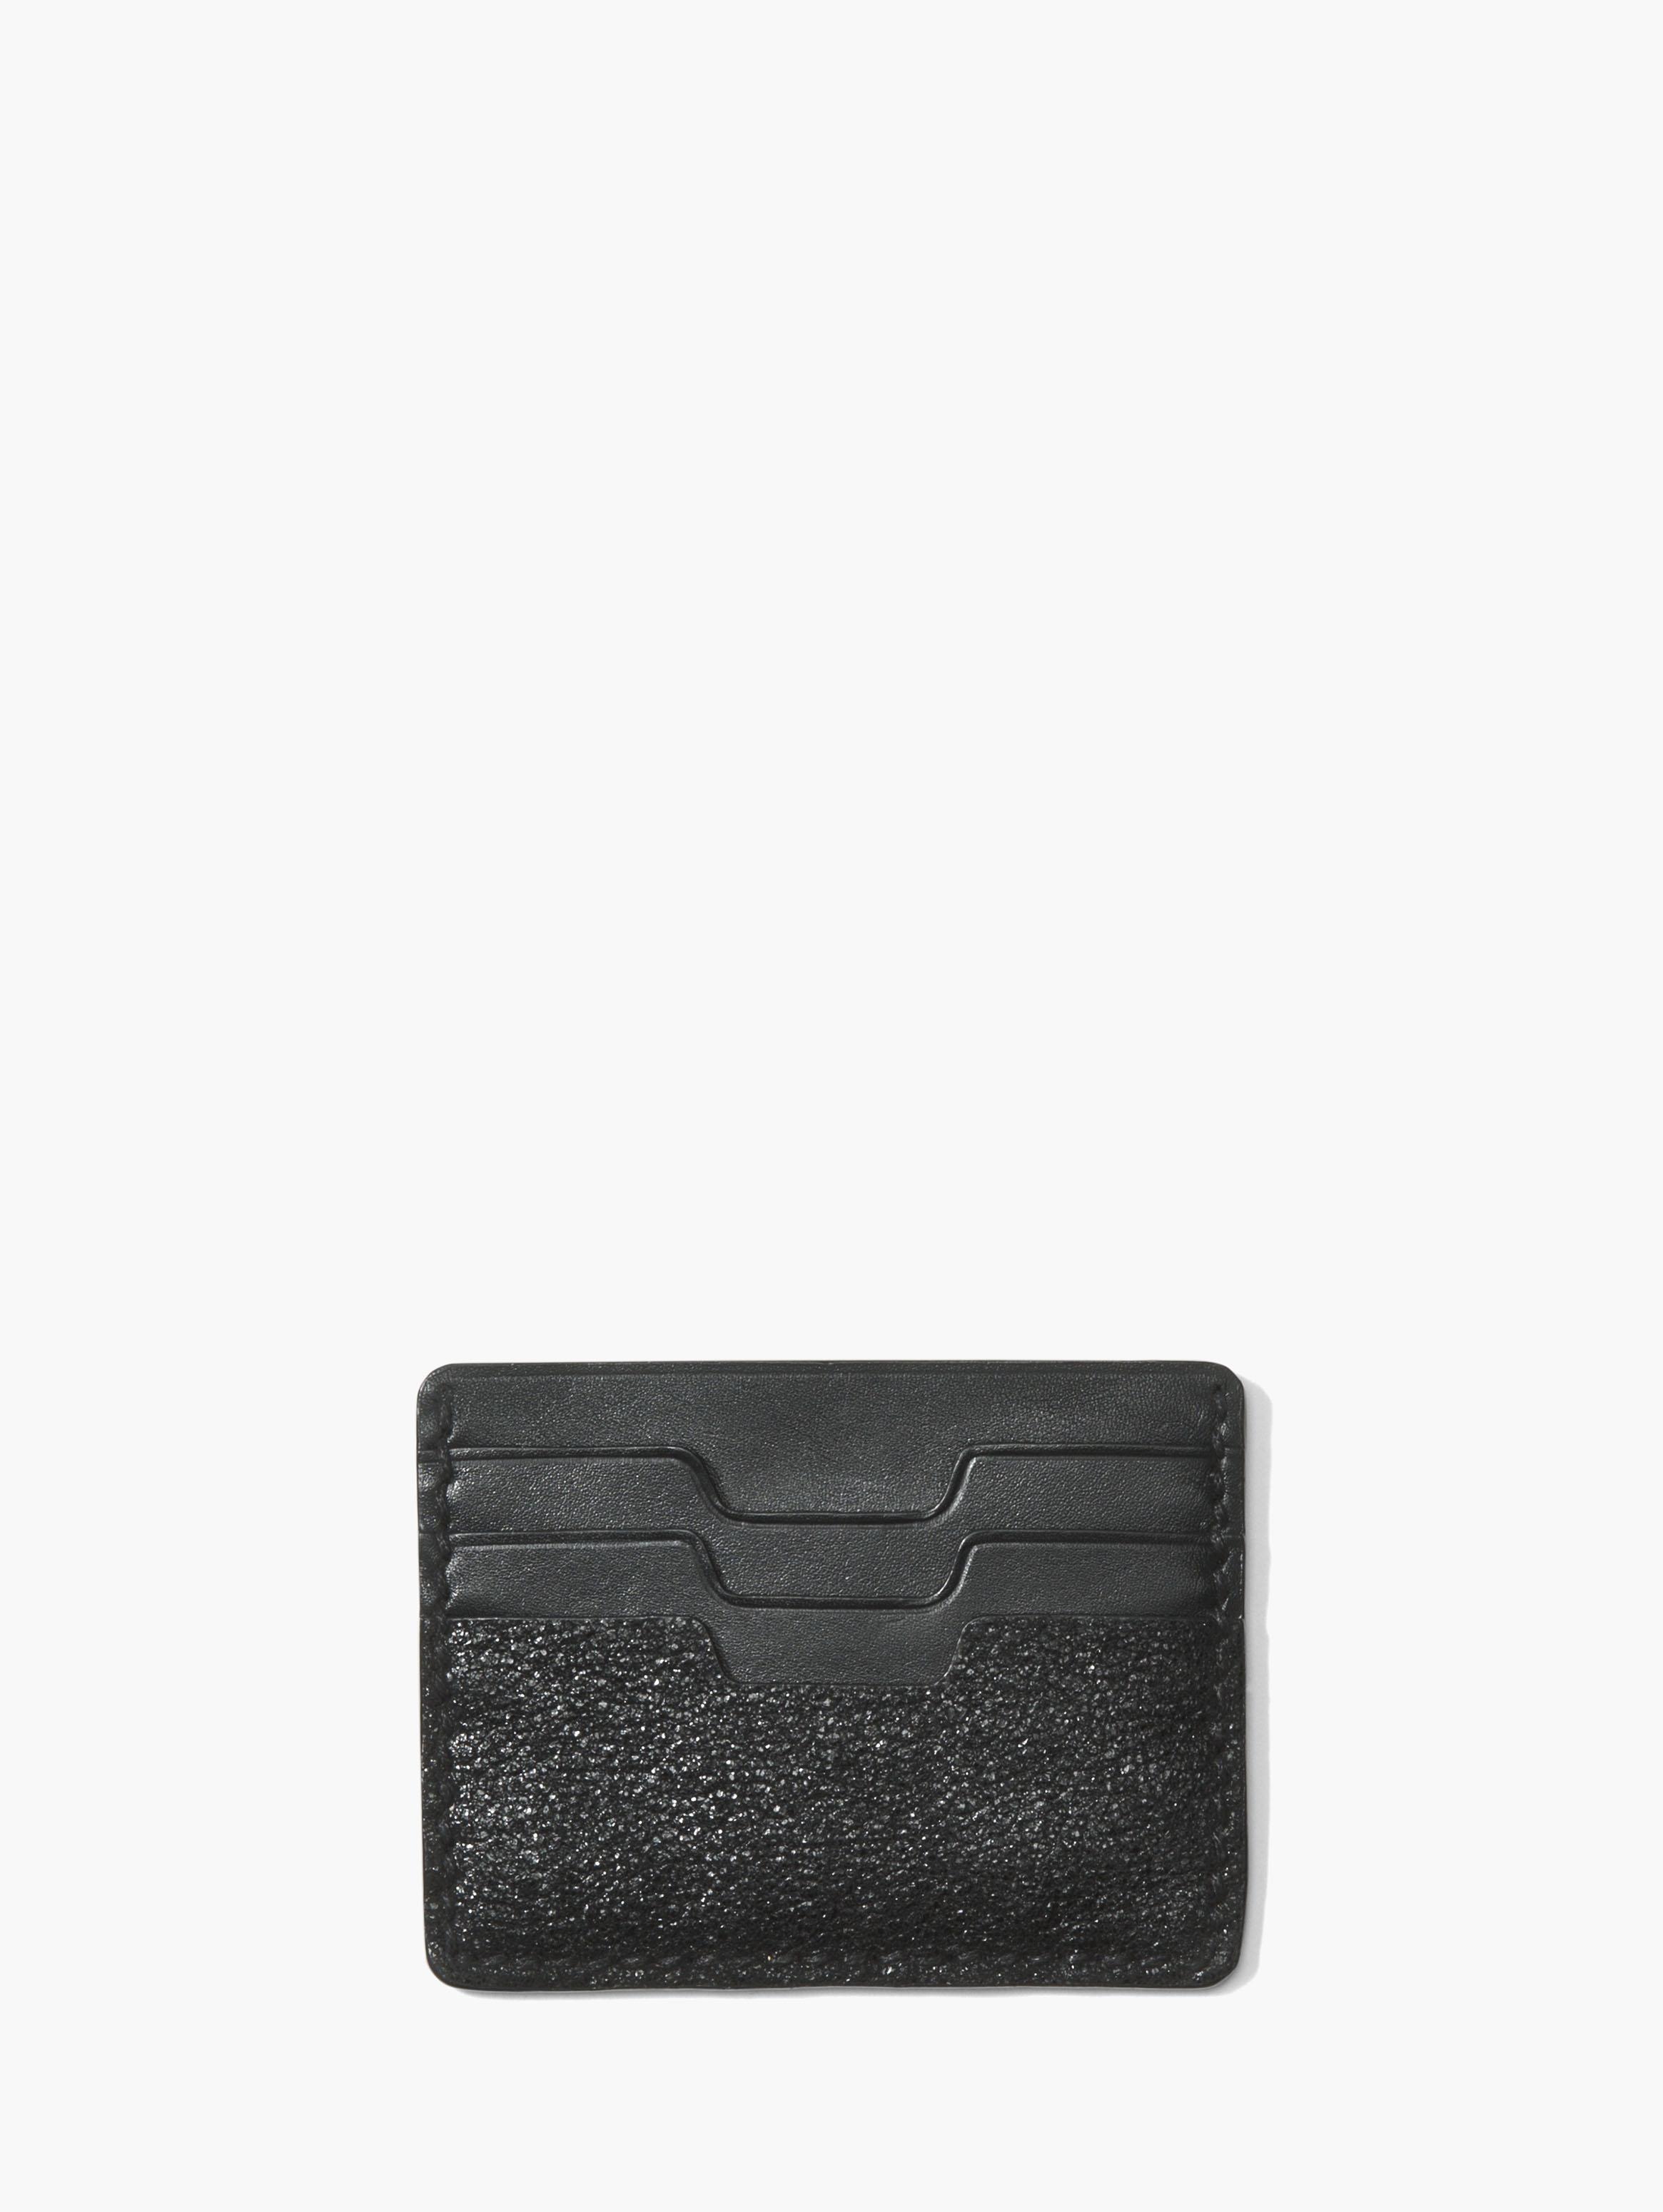 John Varvatos Metallic Leather Card Case